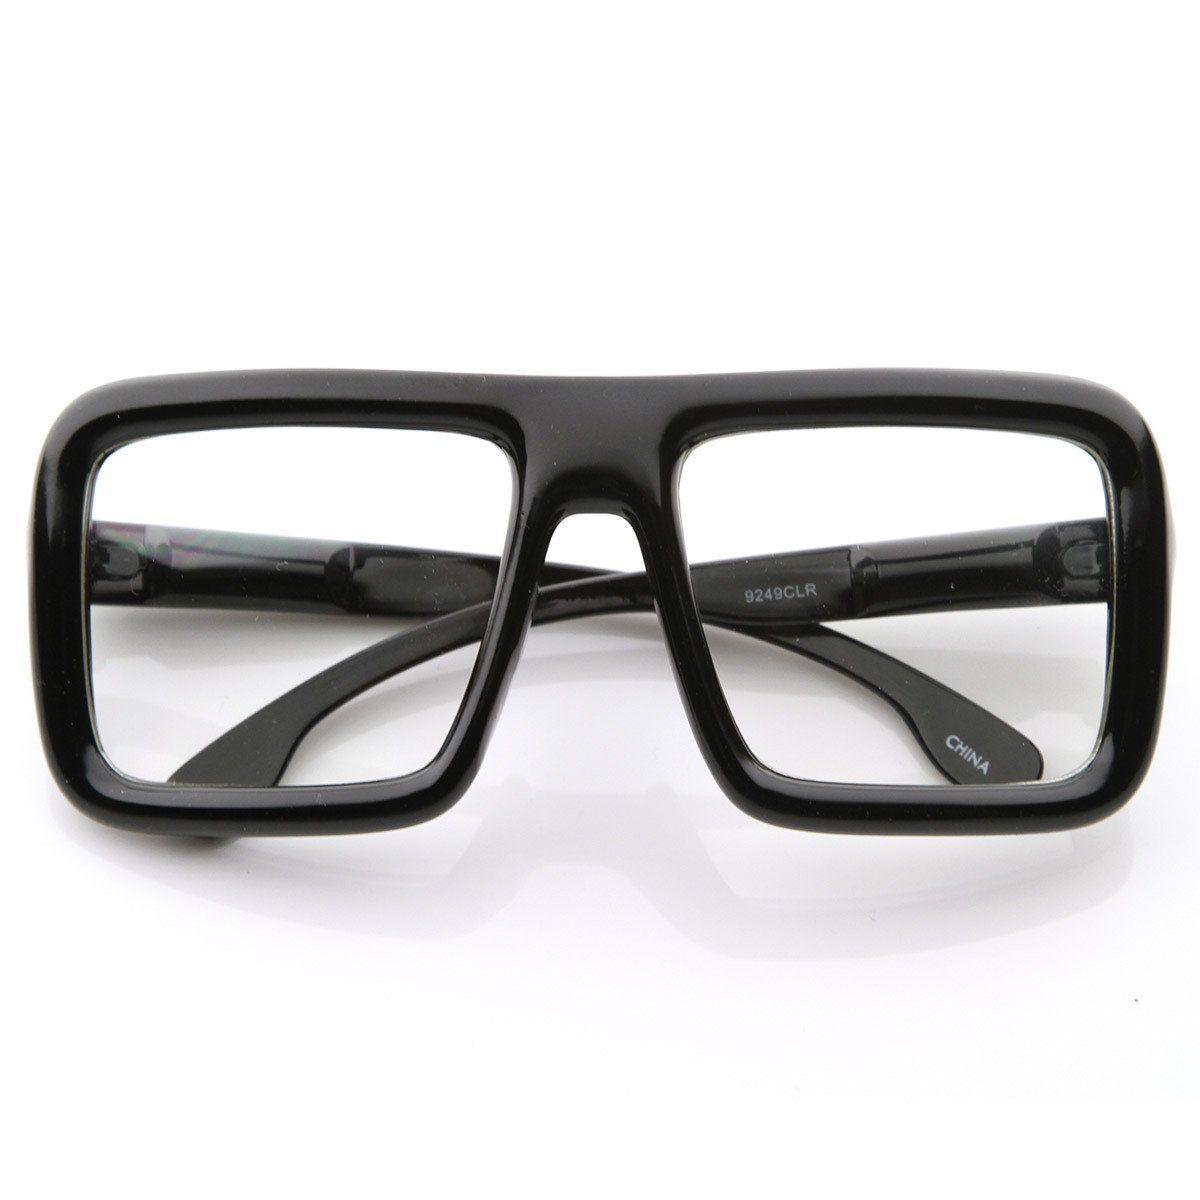 93eebee6c87 Aluminum Eyeglasses from EXOvault